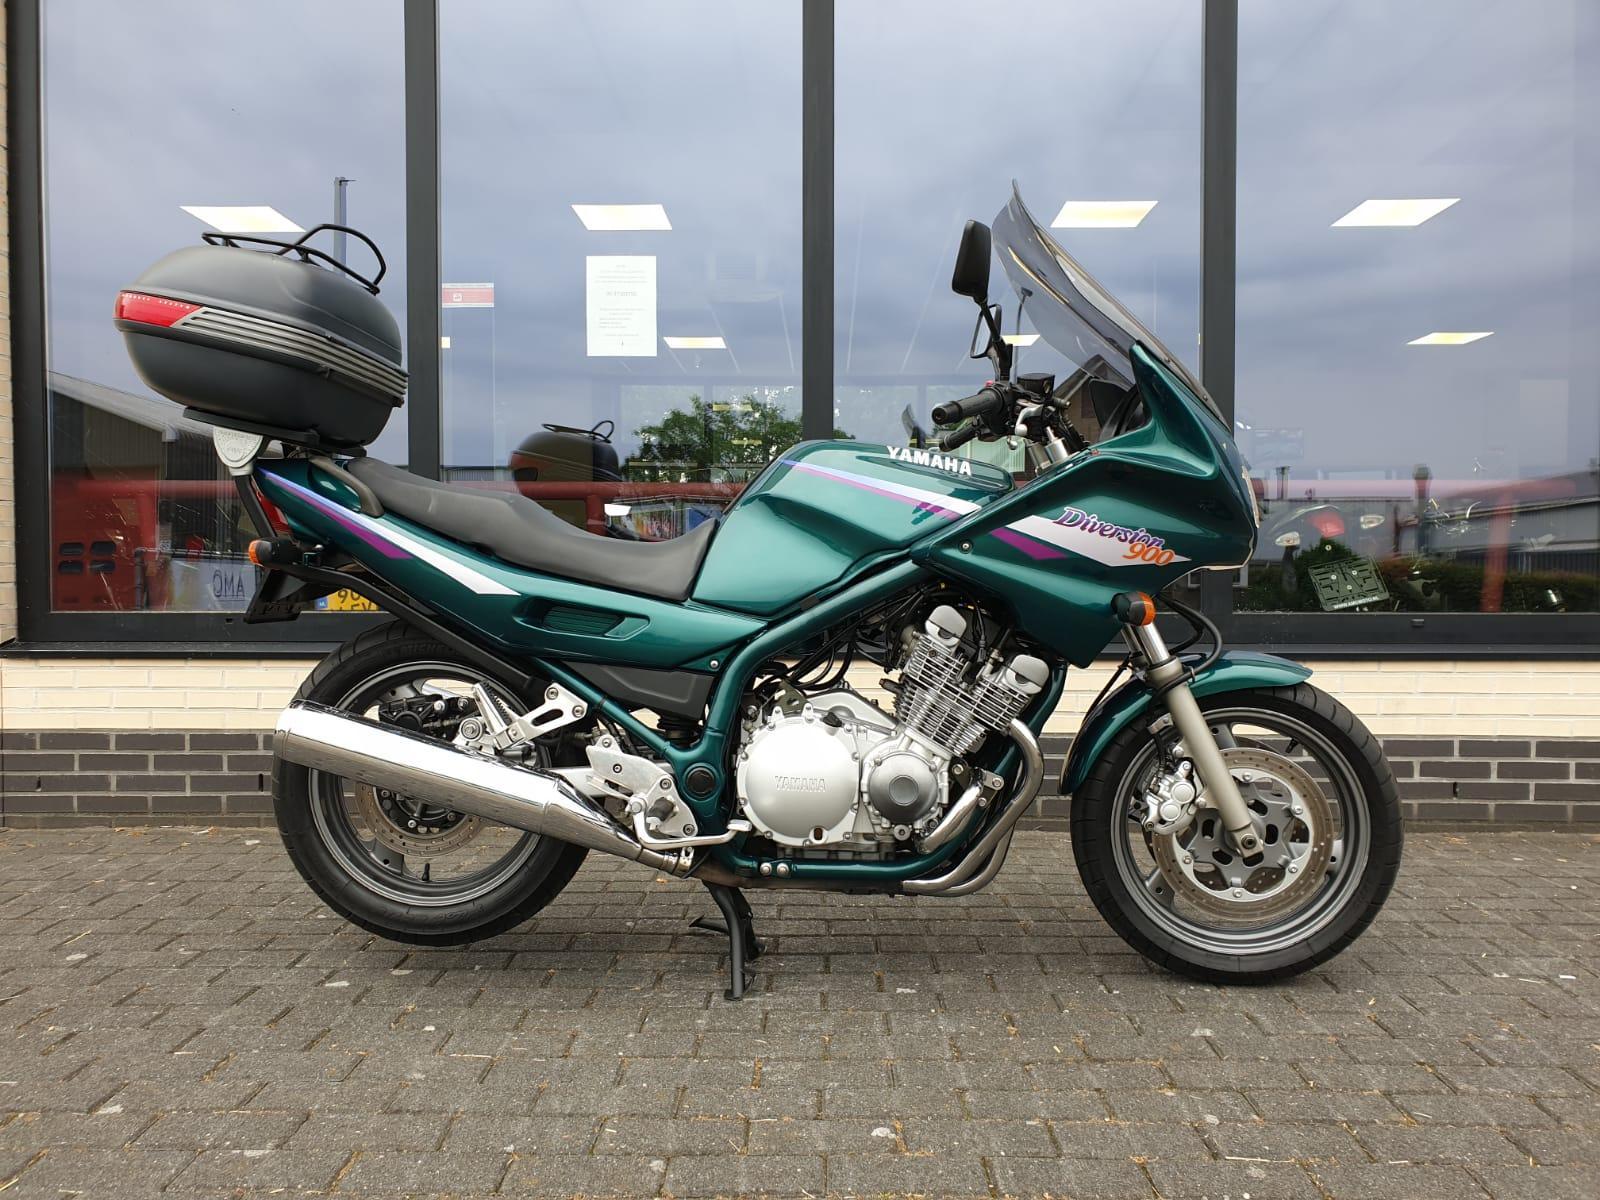 Yamaha XJ 900 S Diversion Vaihtokin 900 cm³ 1999 - Nurmes